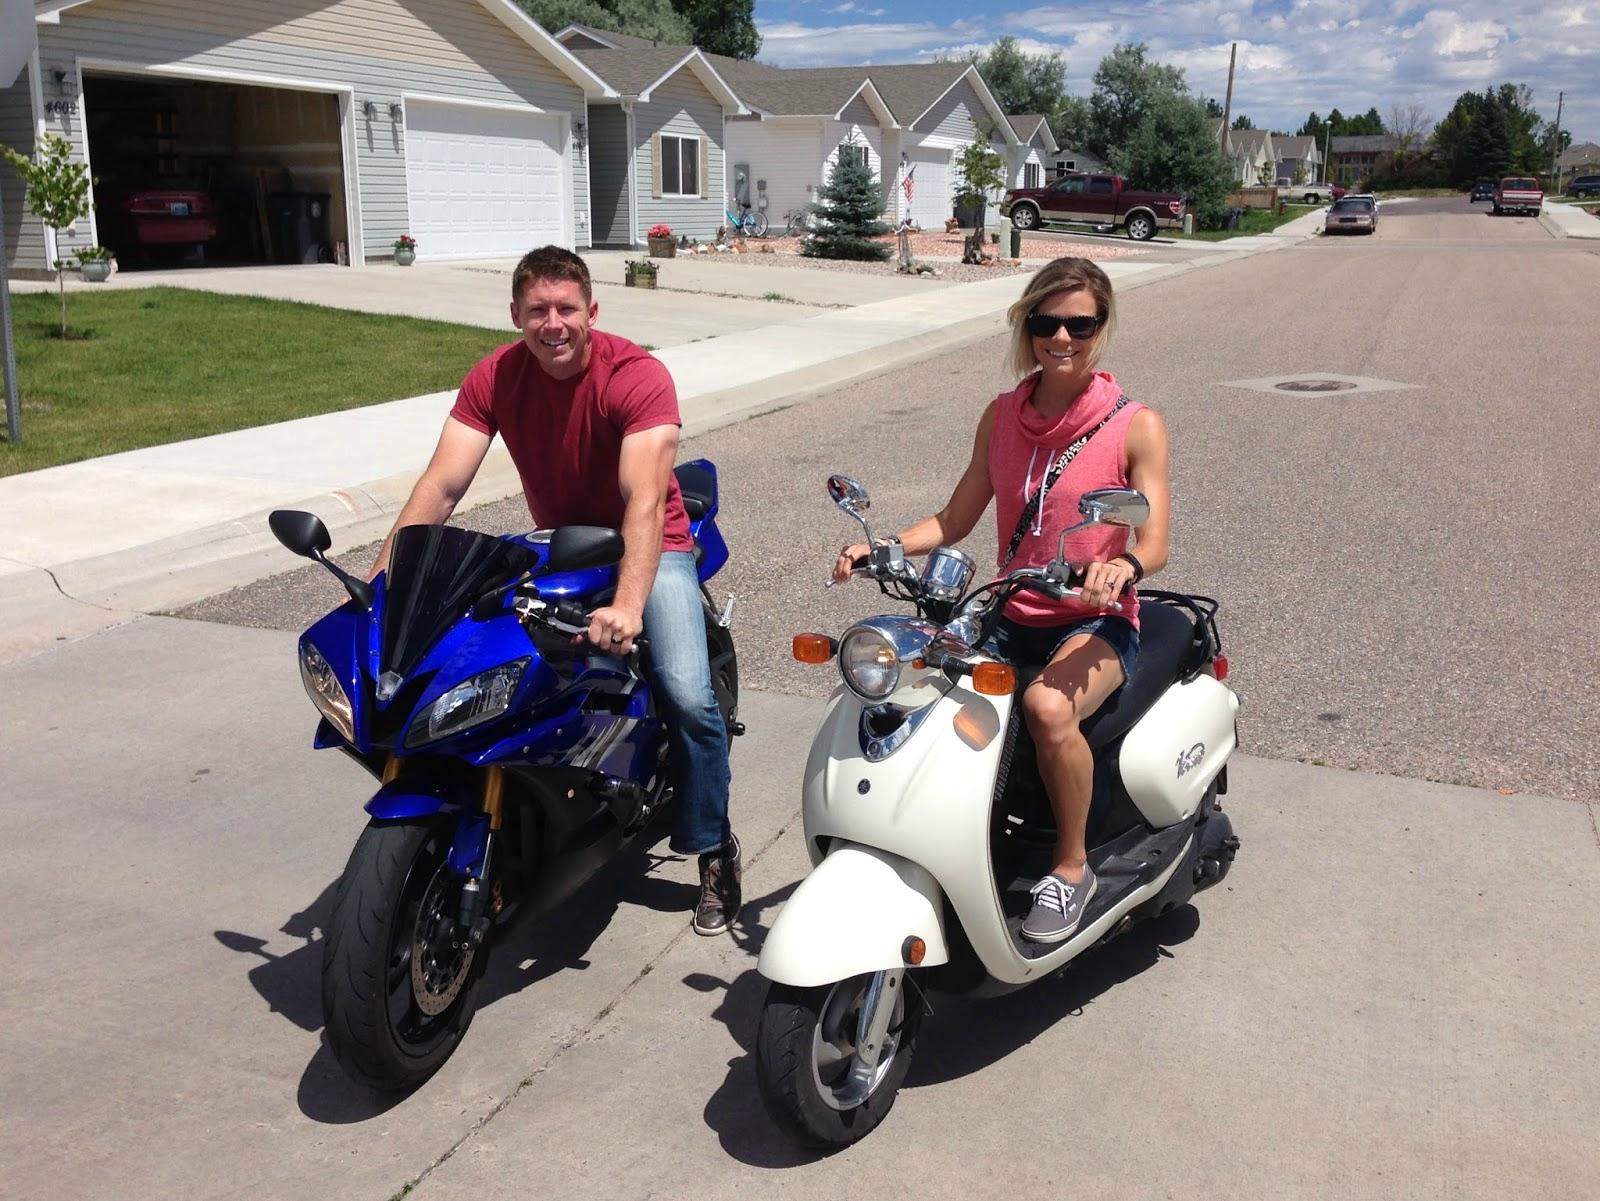 Wyoming Road Trip, Cheyenne Wyoming, Scooter Rides